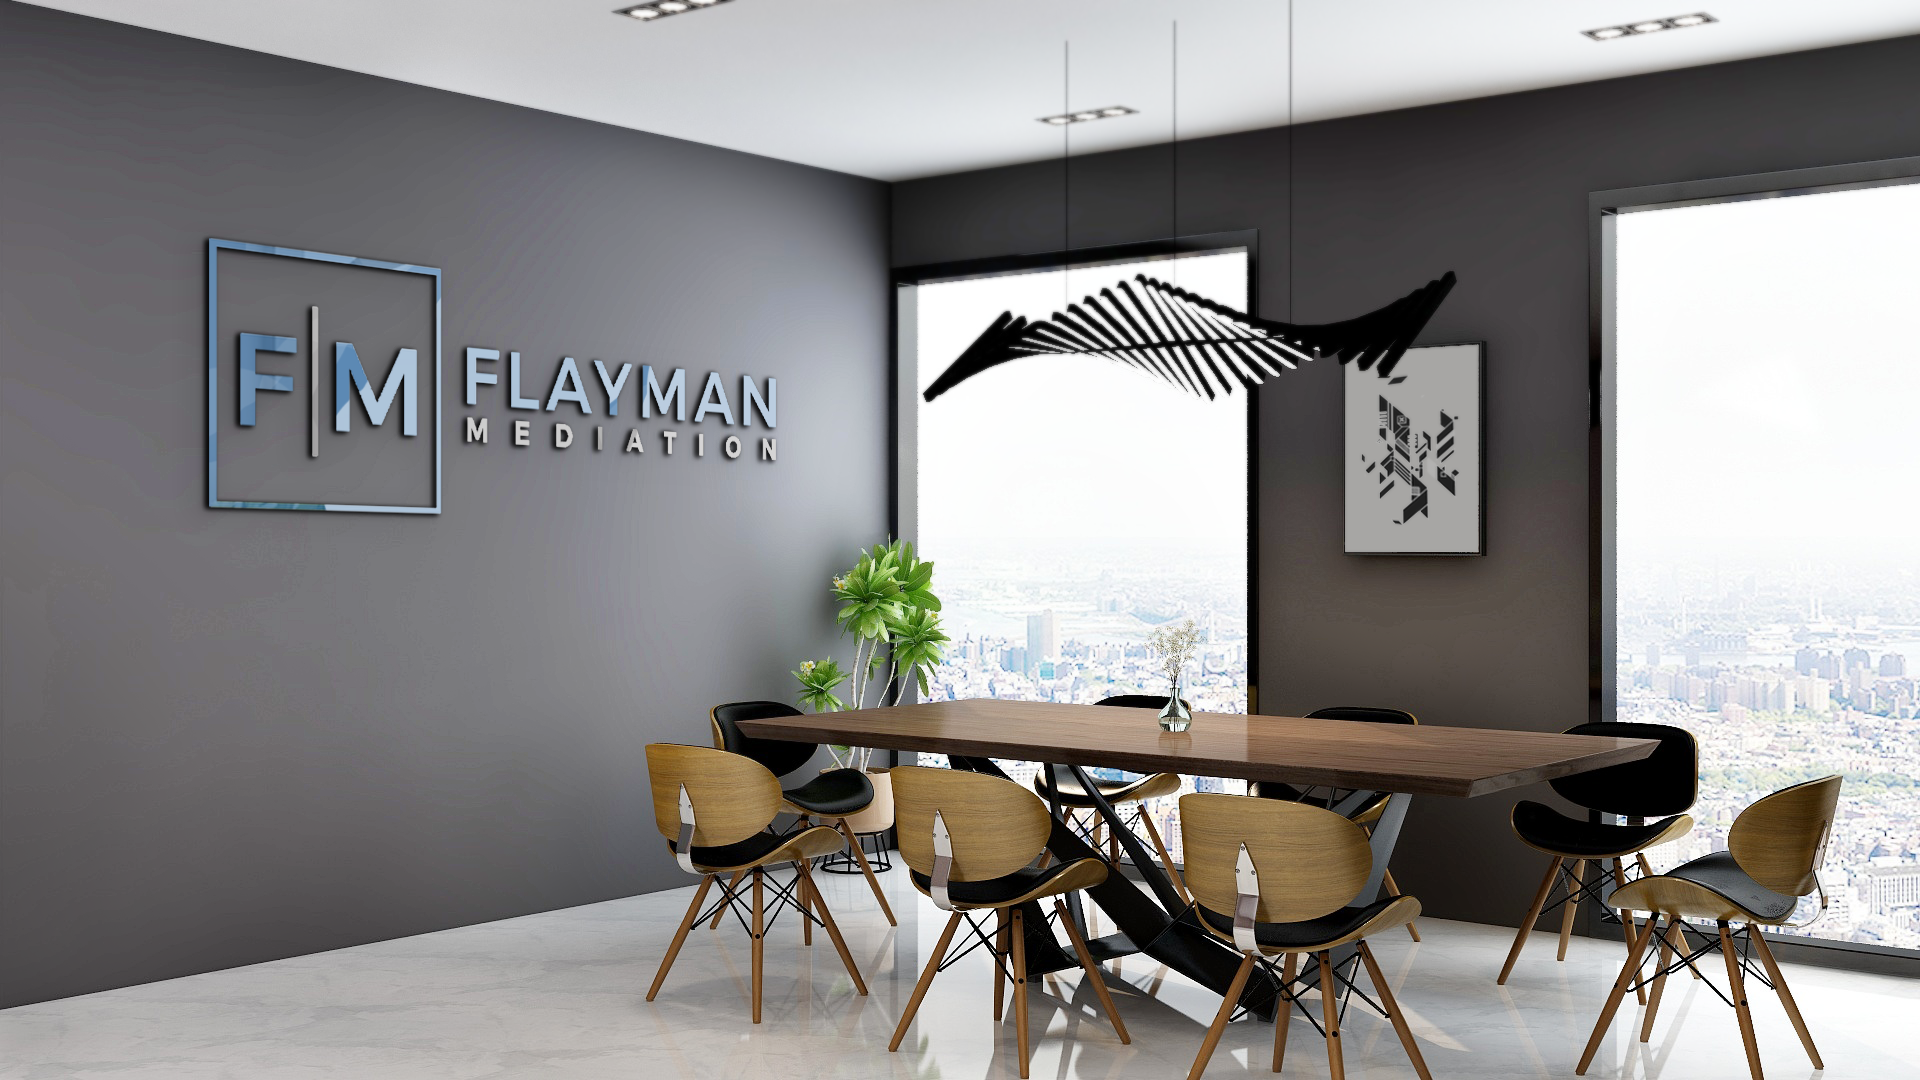 Flayman Mediation -- Zoom background